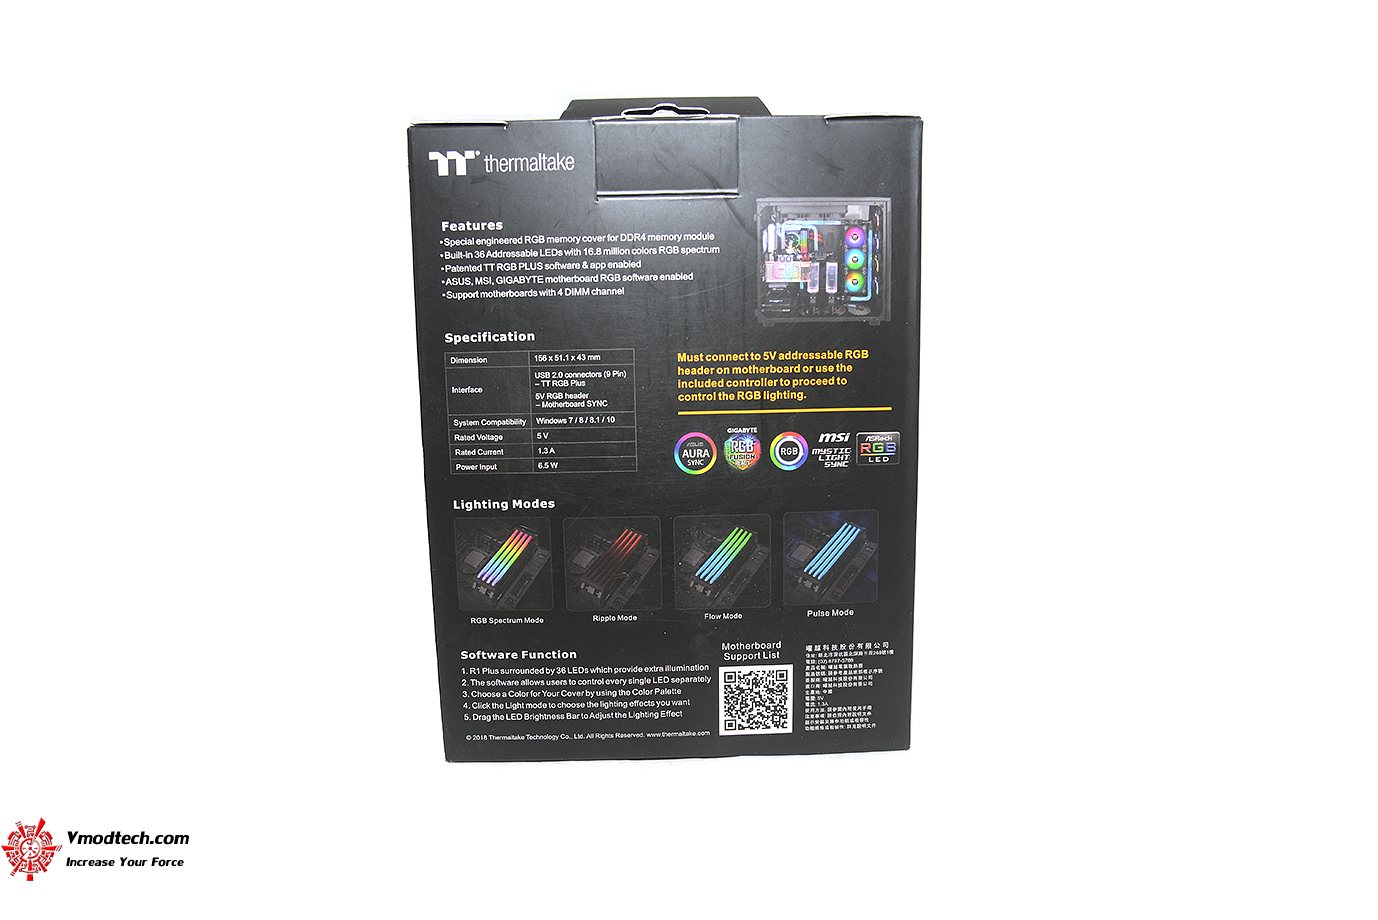 dsc 5451 Thermaltake Pacific R1 Plus DDR4 Memory Lighting Kit Review